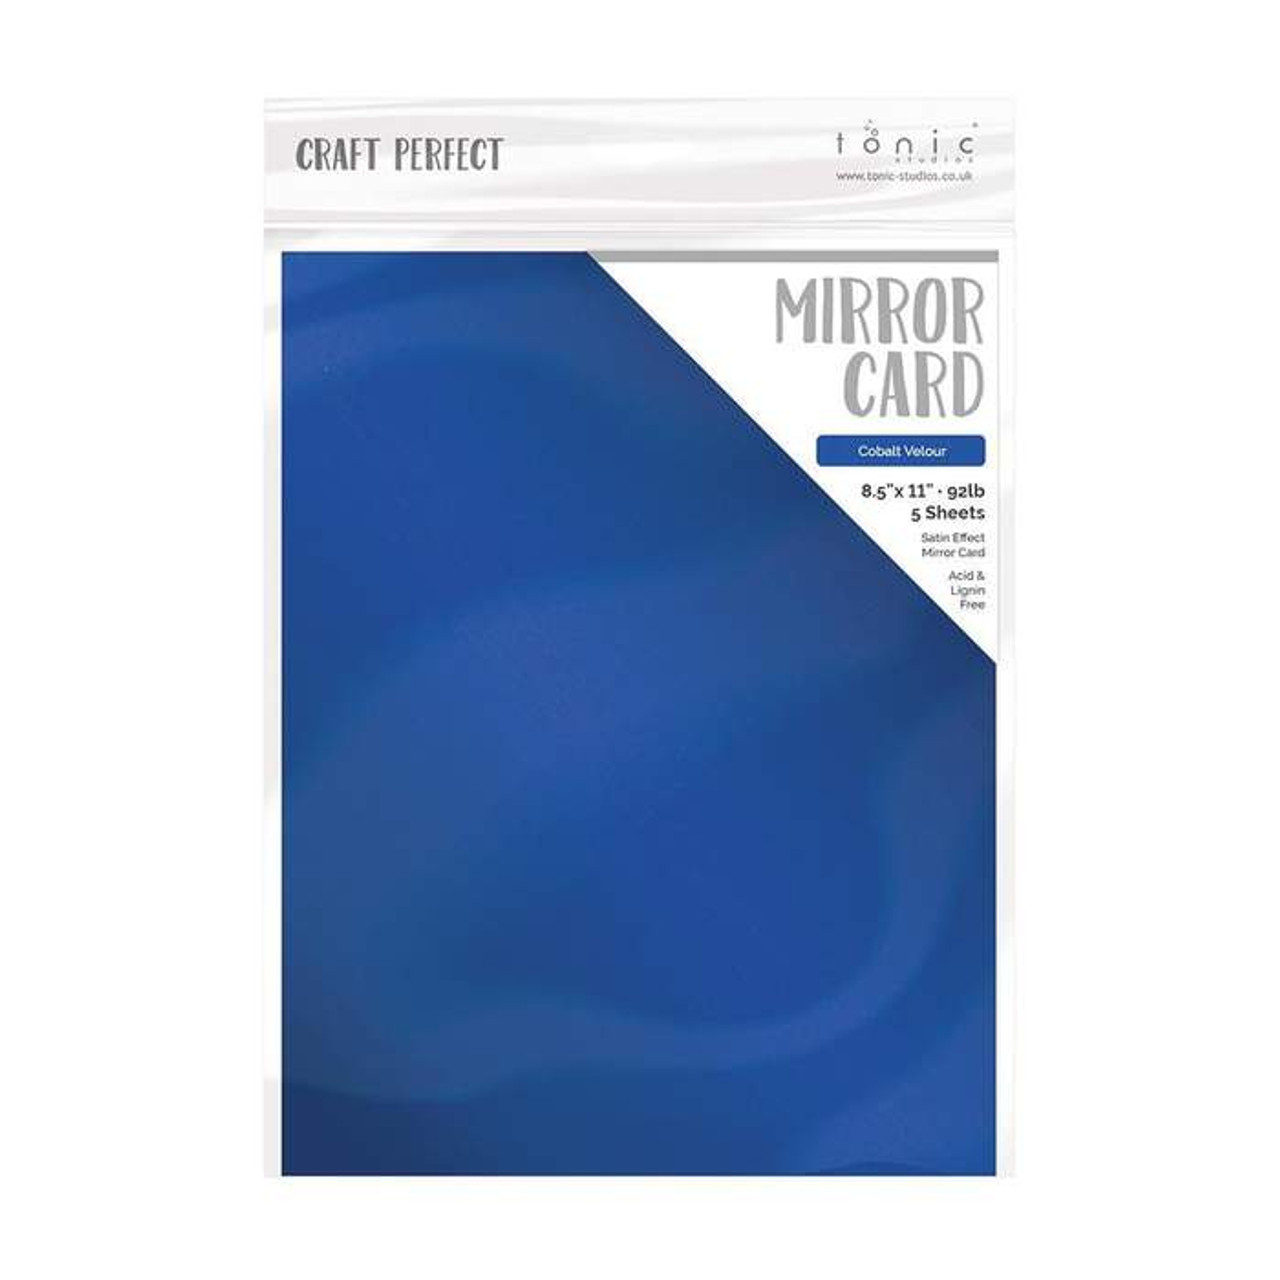 Black Velvet Craft Perfect Satin Mirror Card A4